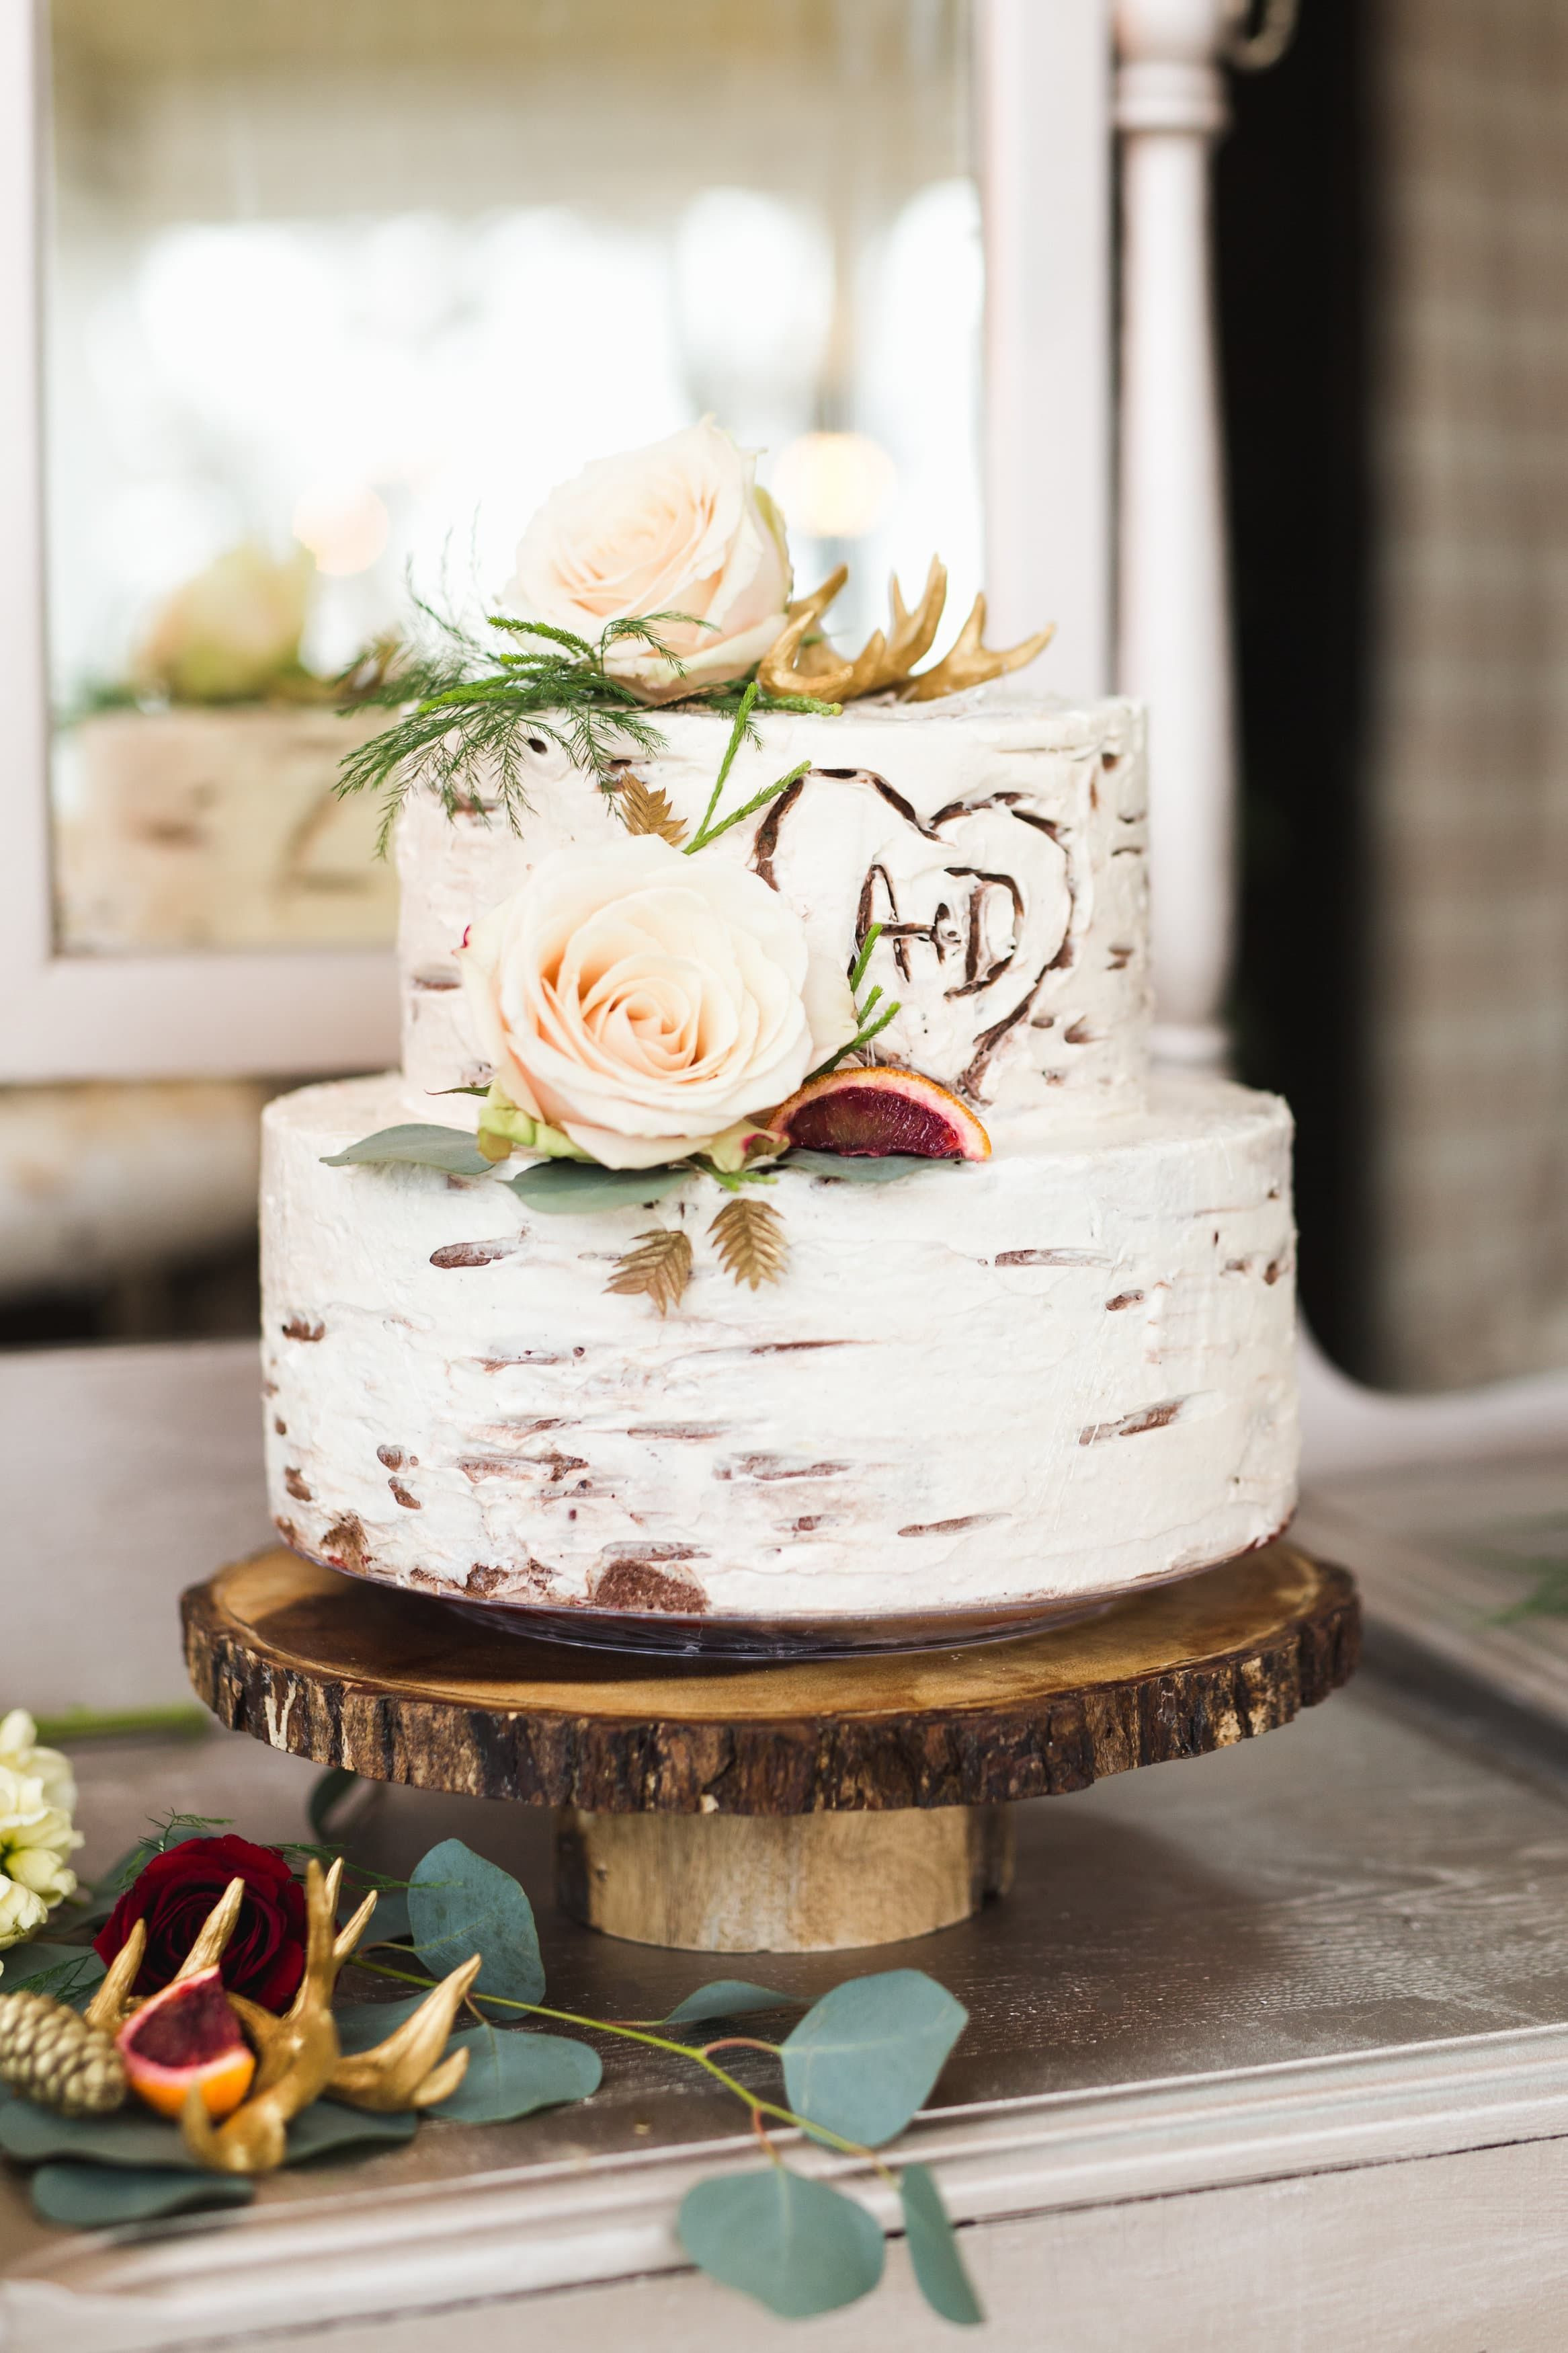 Wedding Cakes Pictures Pinterest  Rustic Romantic Inspiration wedding cake ideas